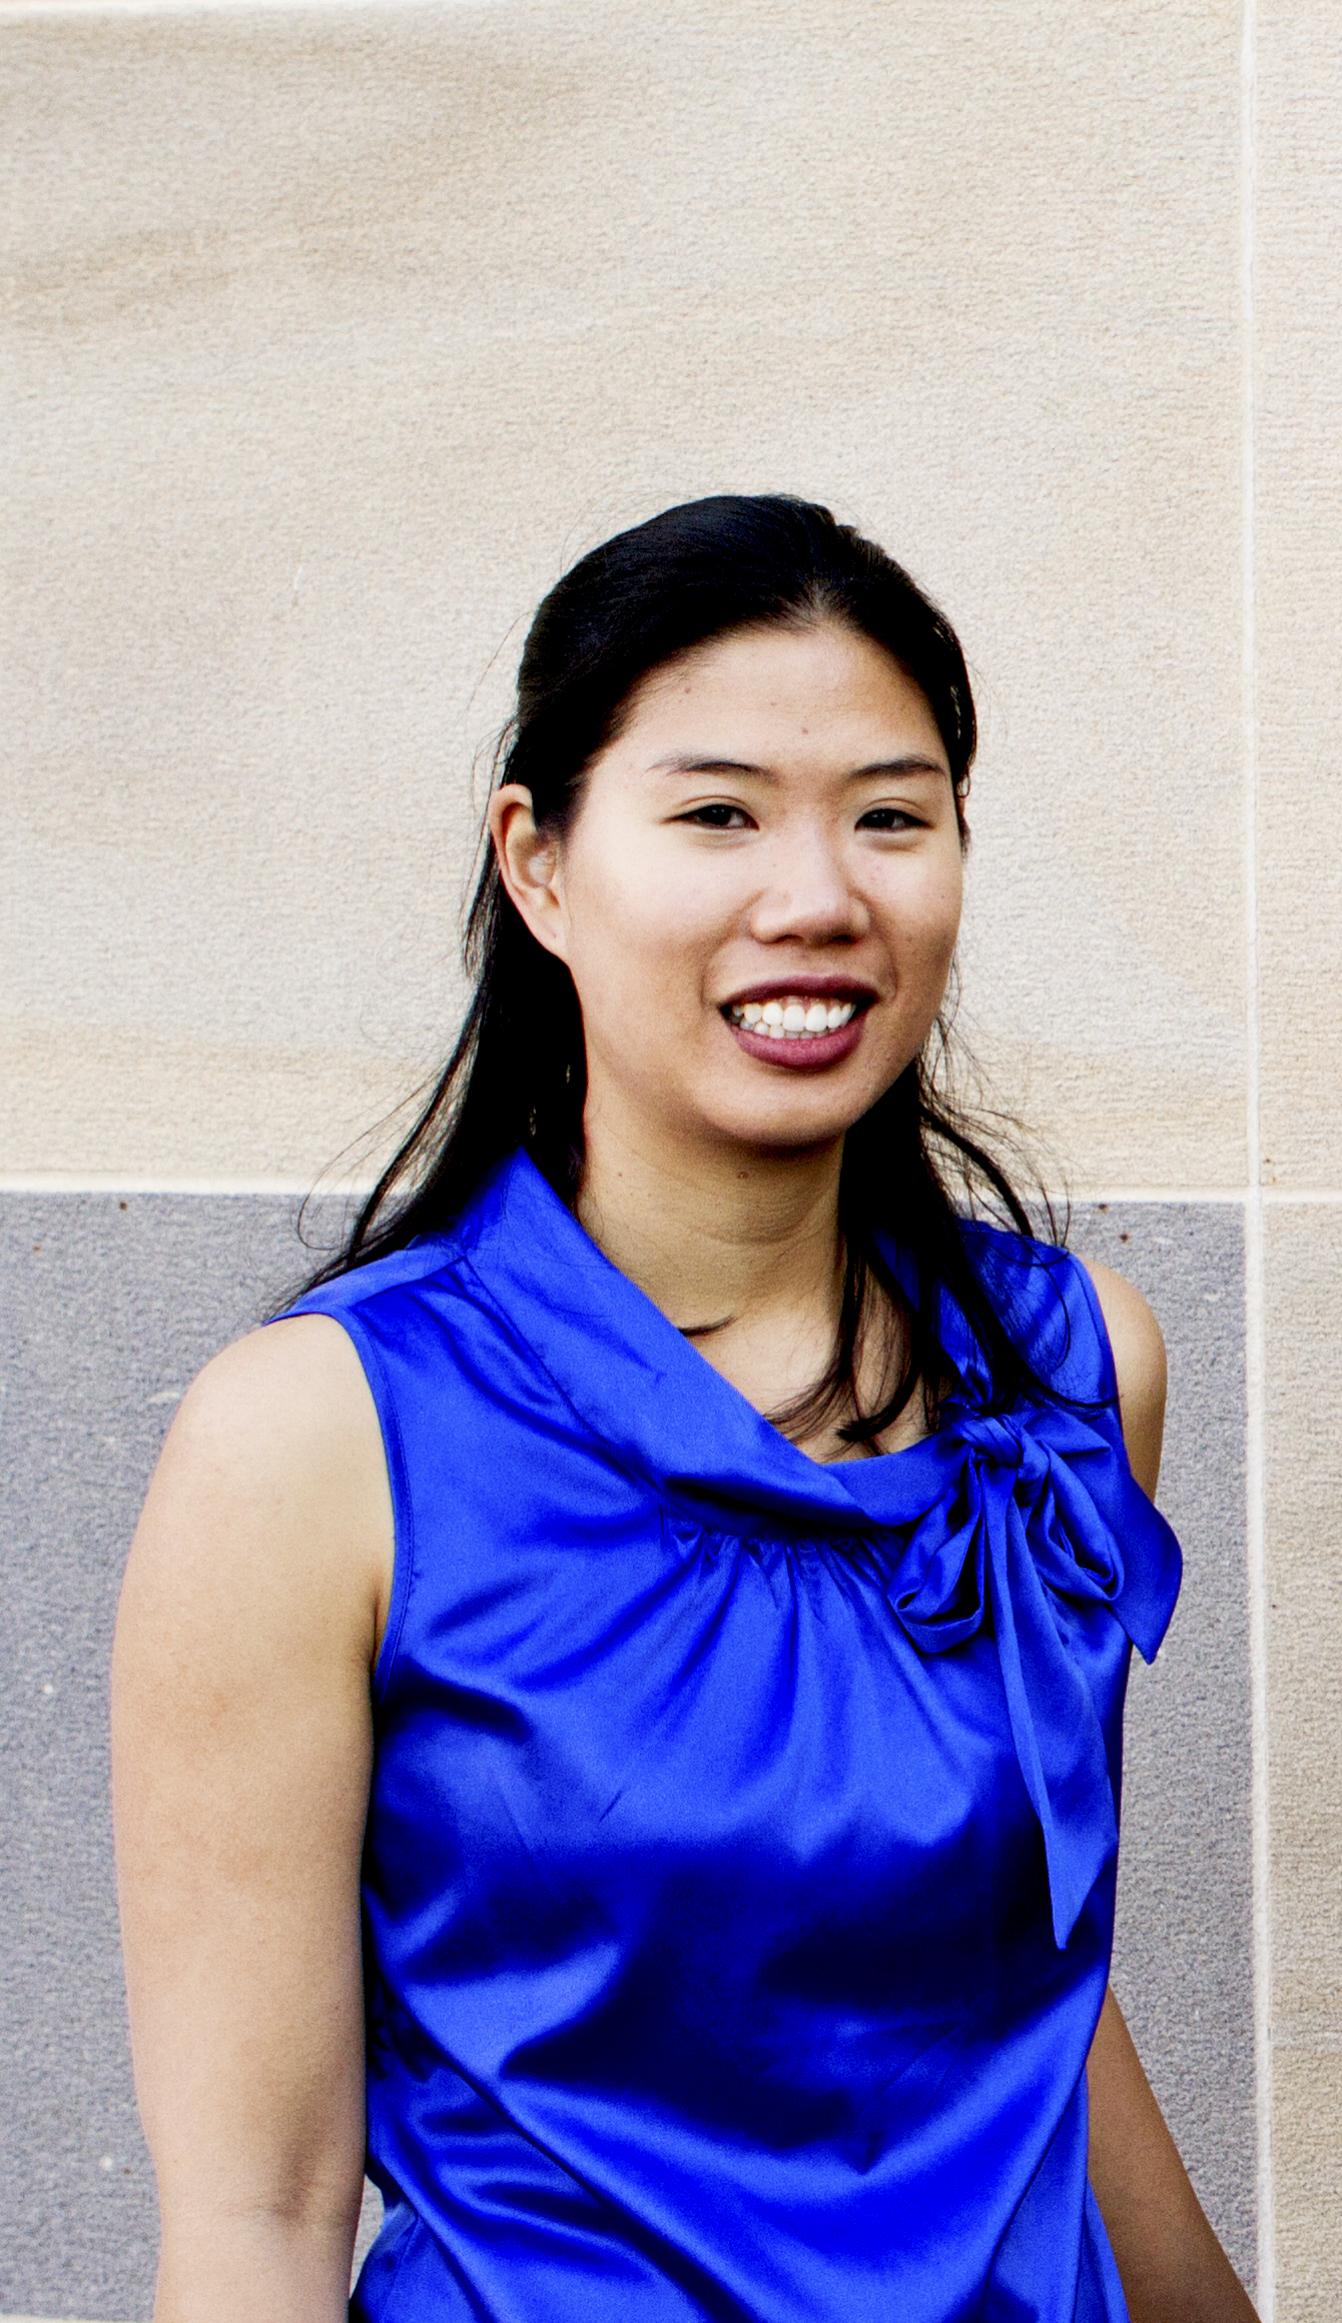 Lee Akinsanya (nee Cheong)